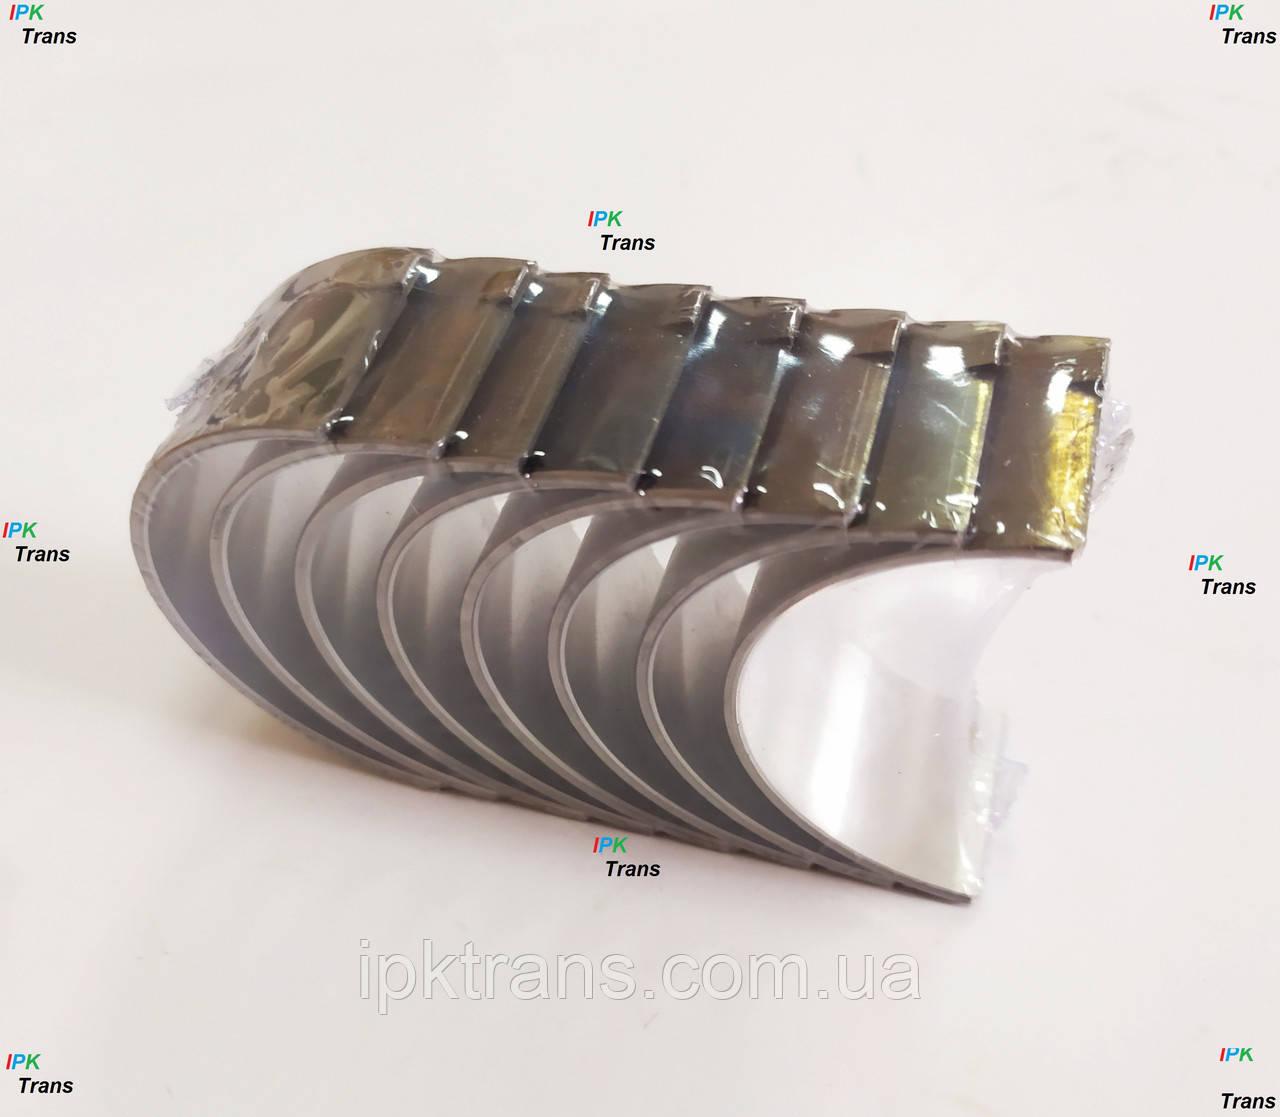 Вкладыши шатунные двигателя XINCHAI C490BPG (+0,25) 490B04007